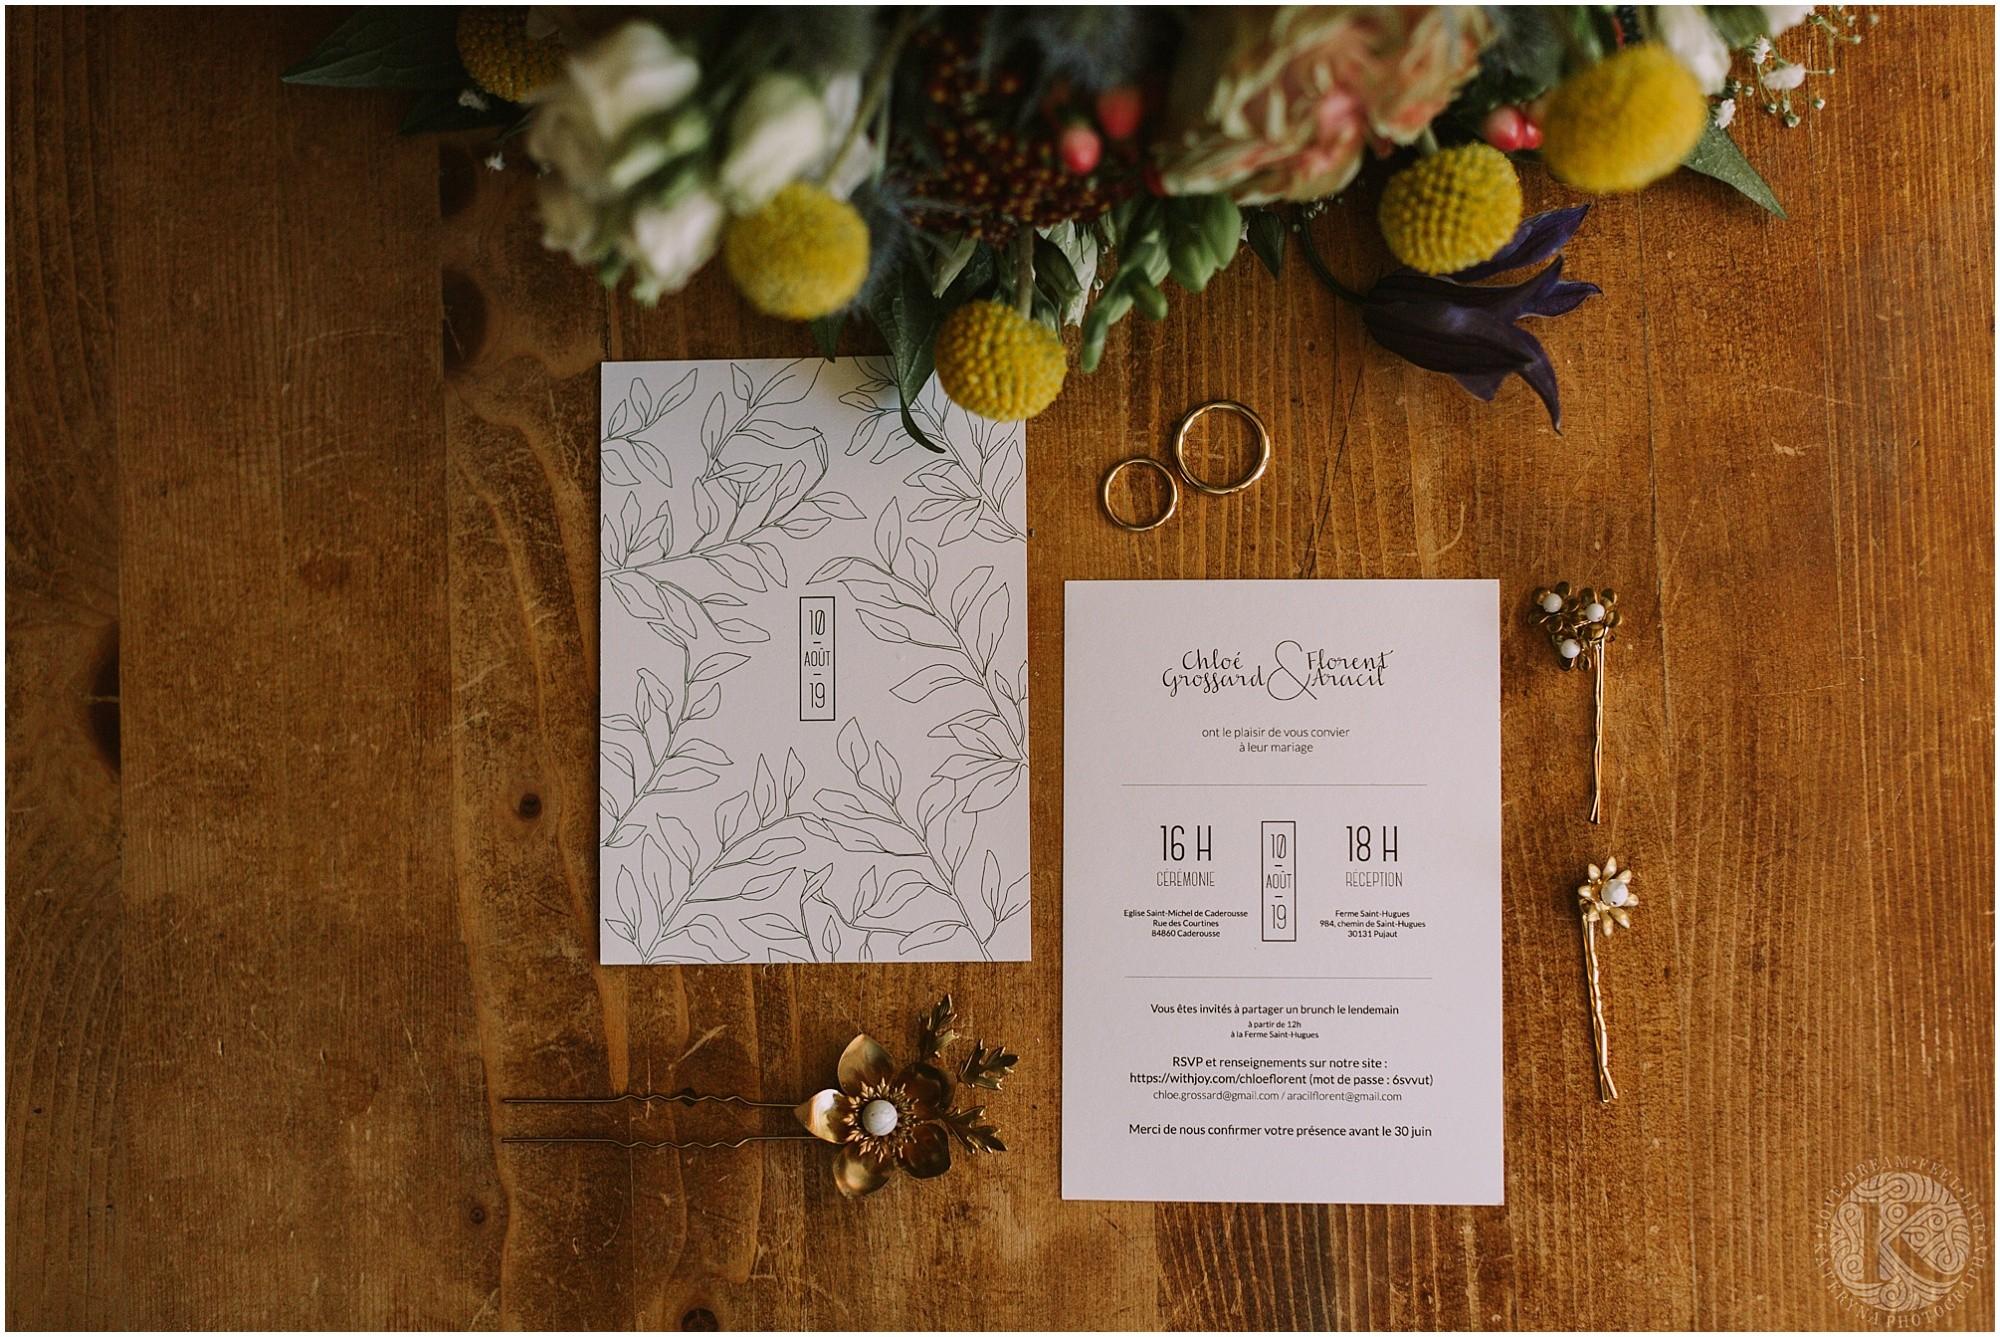 Kateryna-photos-photographe-mariage-vaucluse-provence-avignon-ferme-st-hugues_0009.jpg